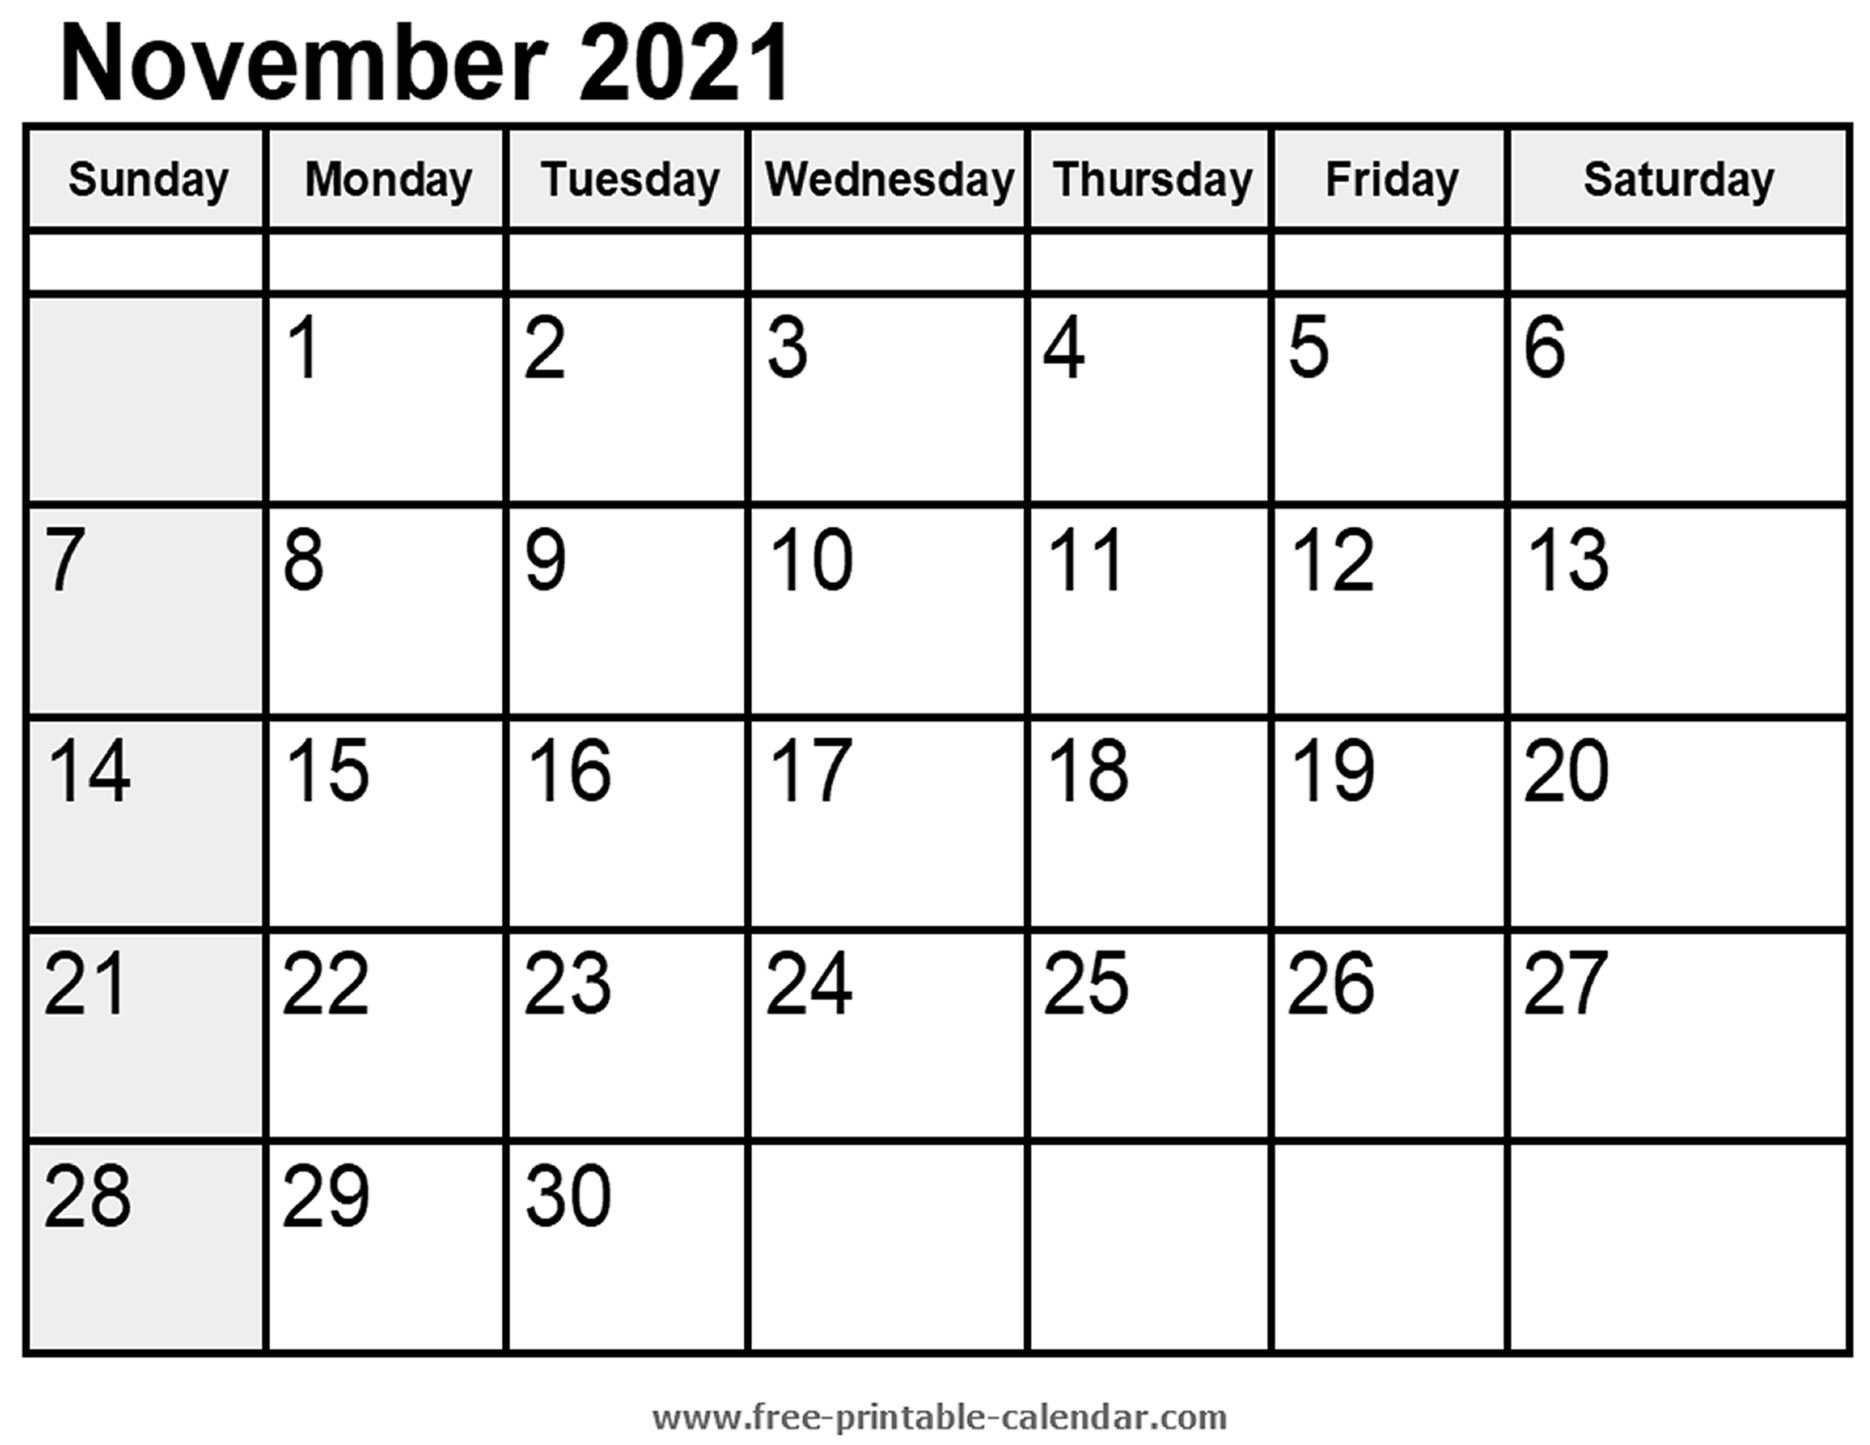 Calendar November 2021 Free Printable Calendar